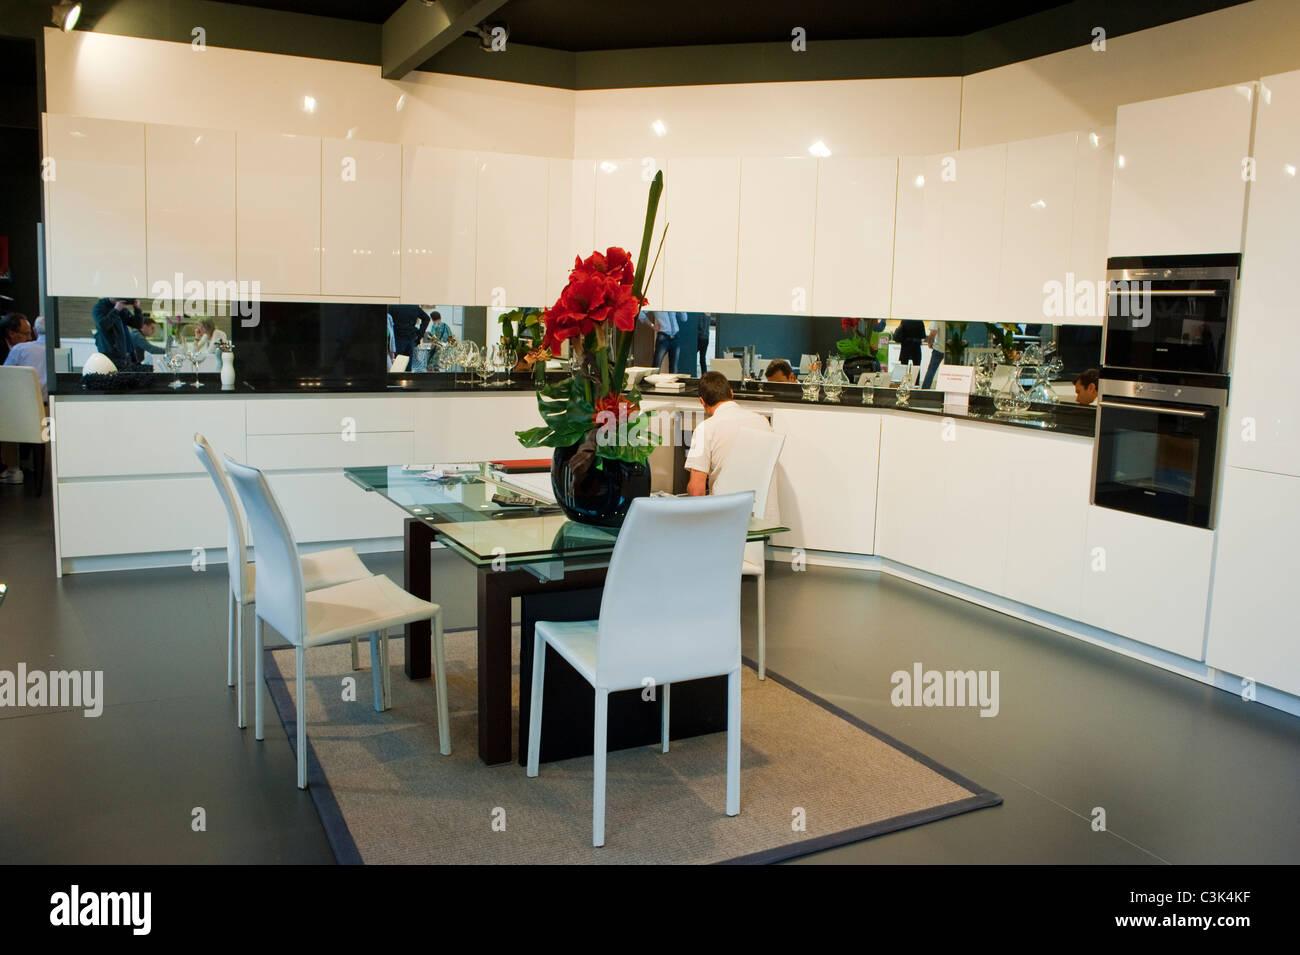 Cucina In Linea Moderna | Linea Piana Cucine Snaidero Showroom Bari ...